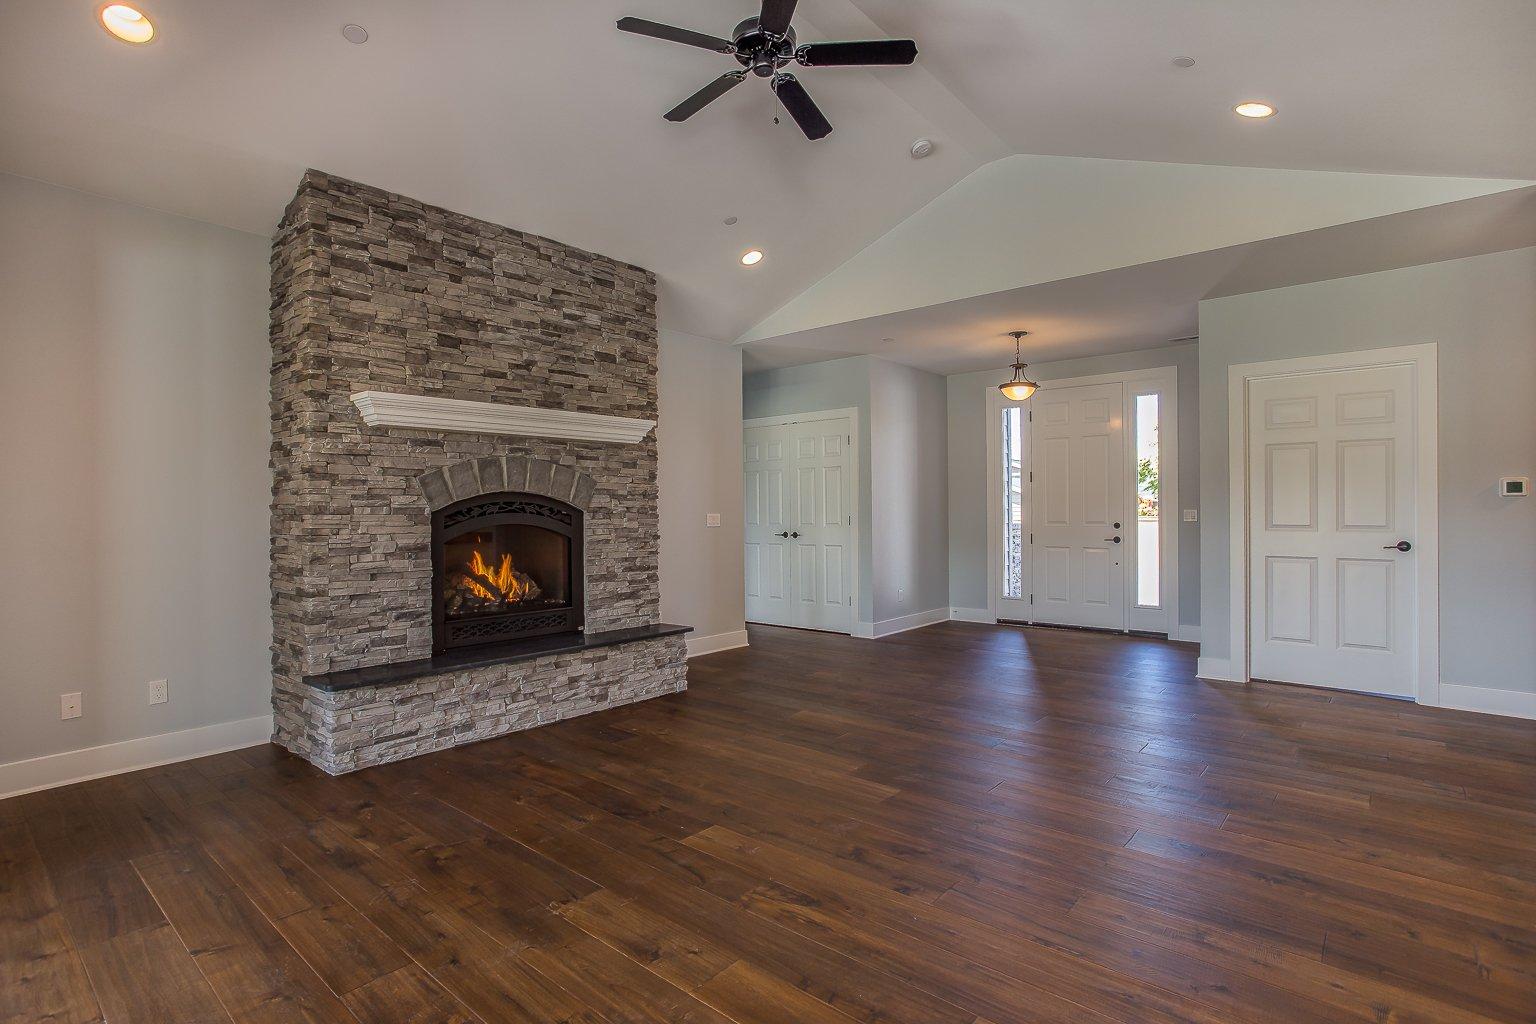 06 Fireplace Wright